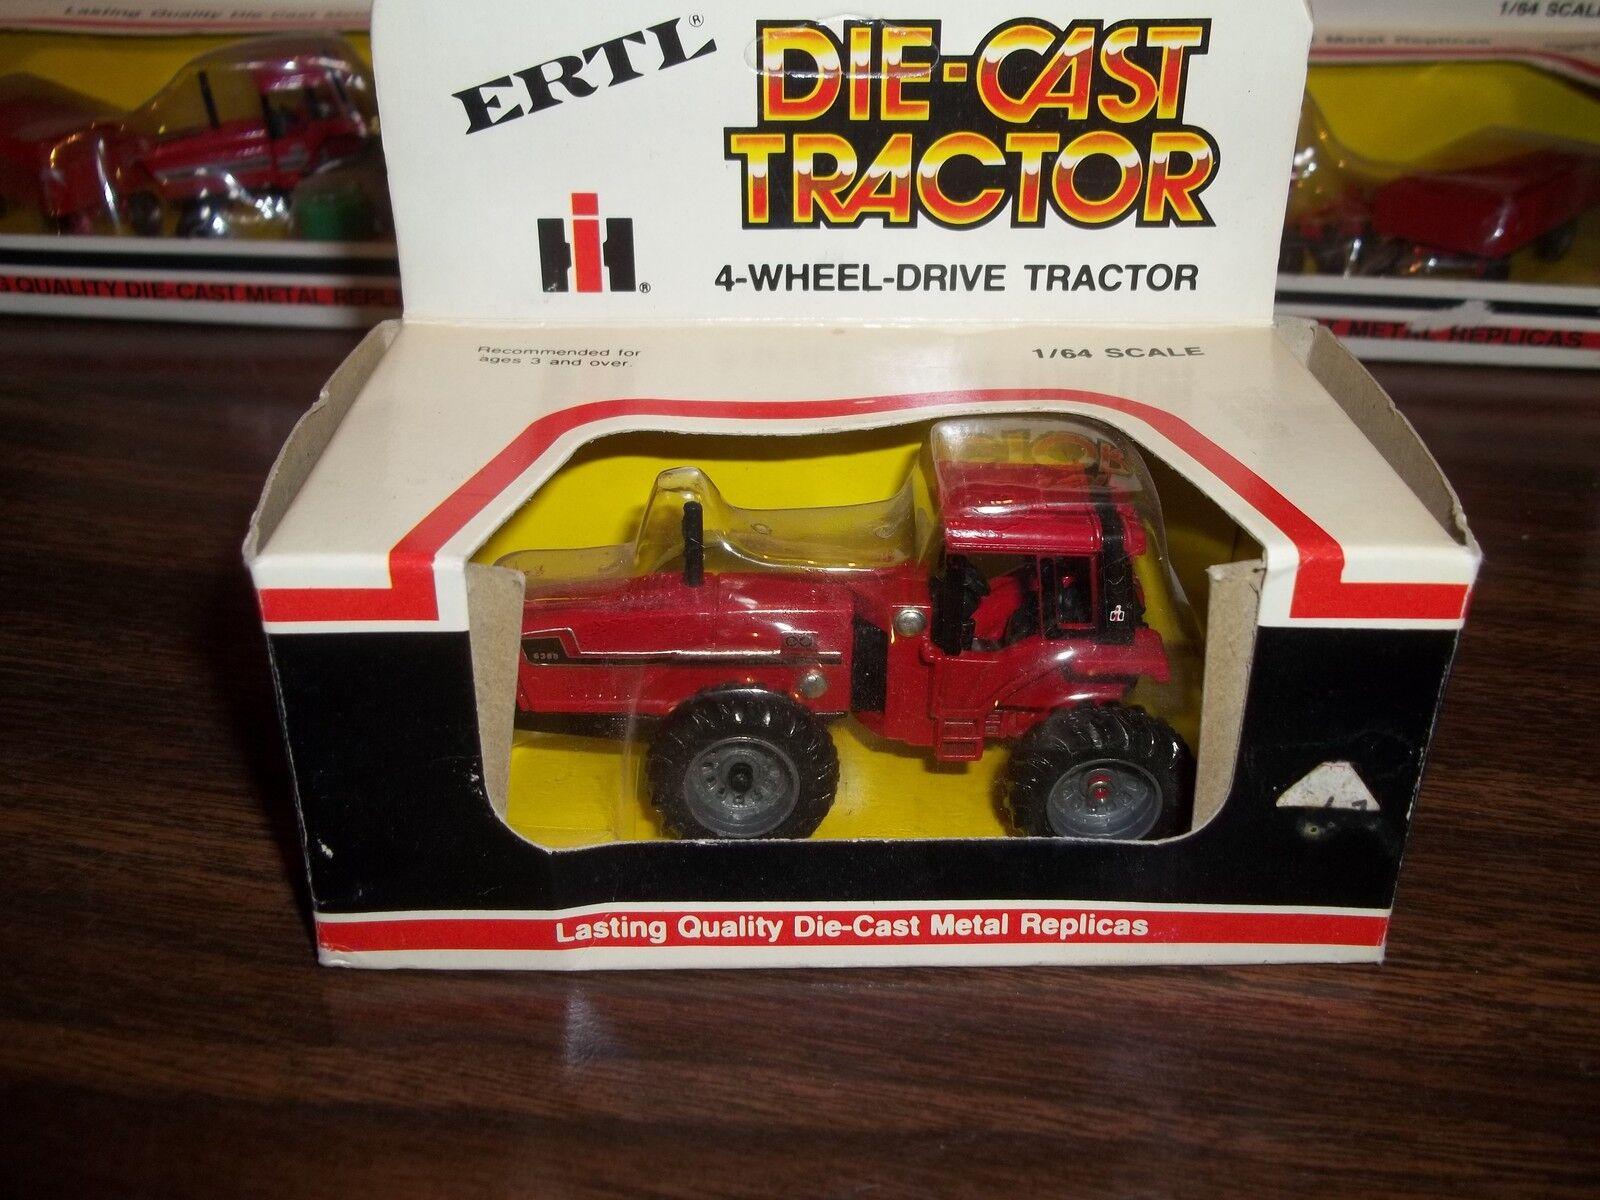 ERTL 1/64 SCALE DIE-CAST INTERNATIONAL 6388 2+2 4-WHEEL-DRIVE TRACTOR PART#1526